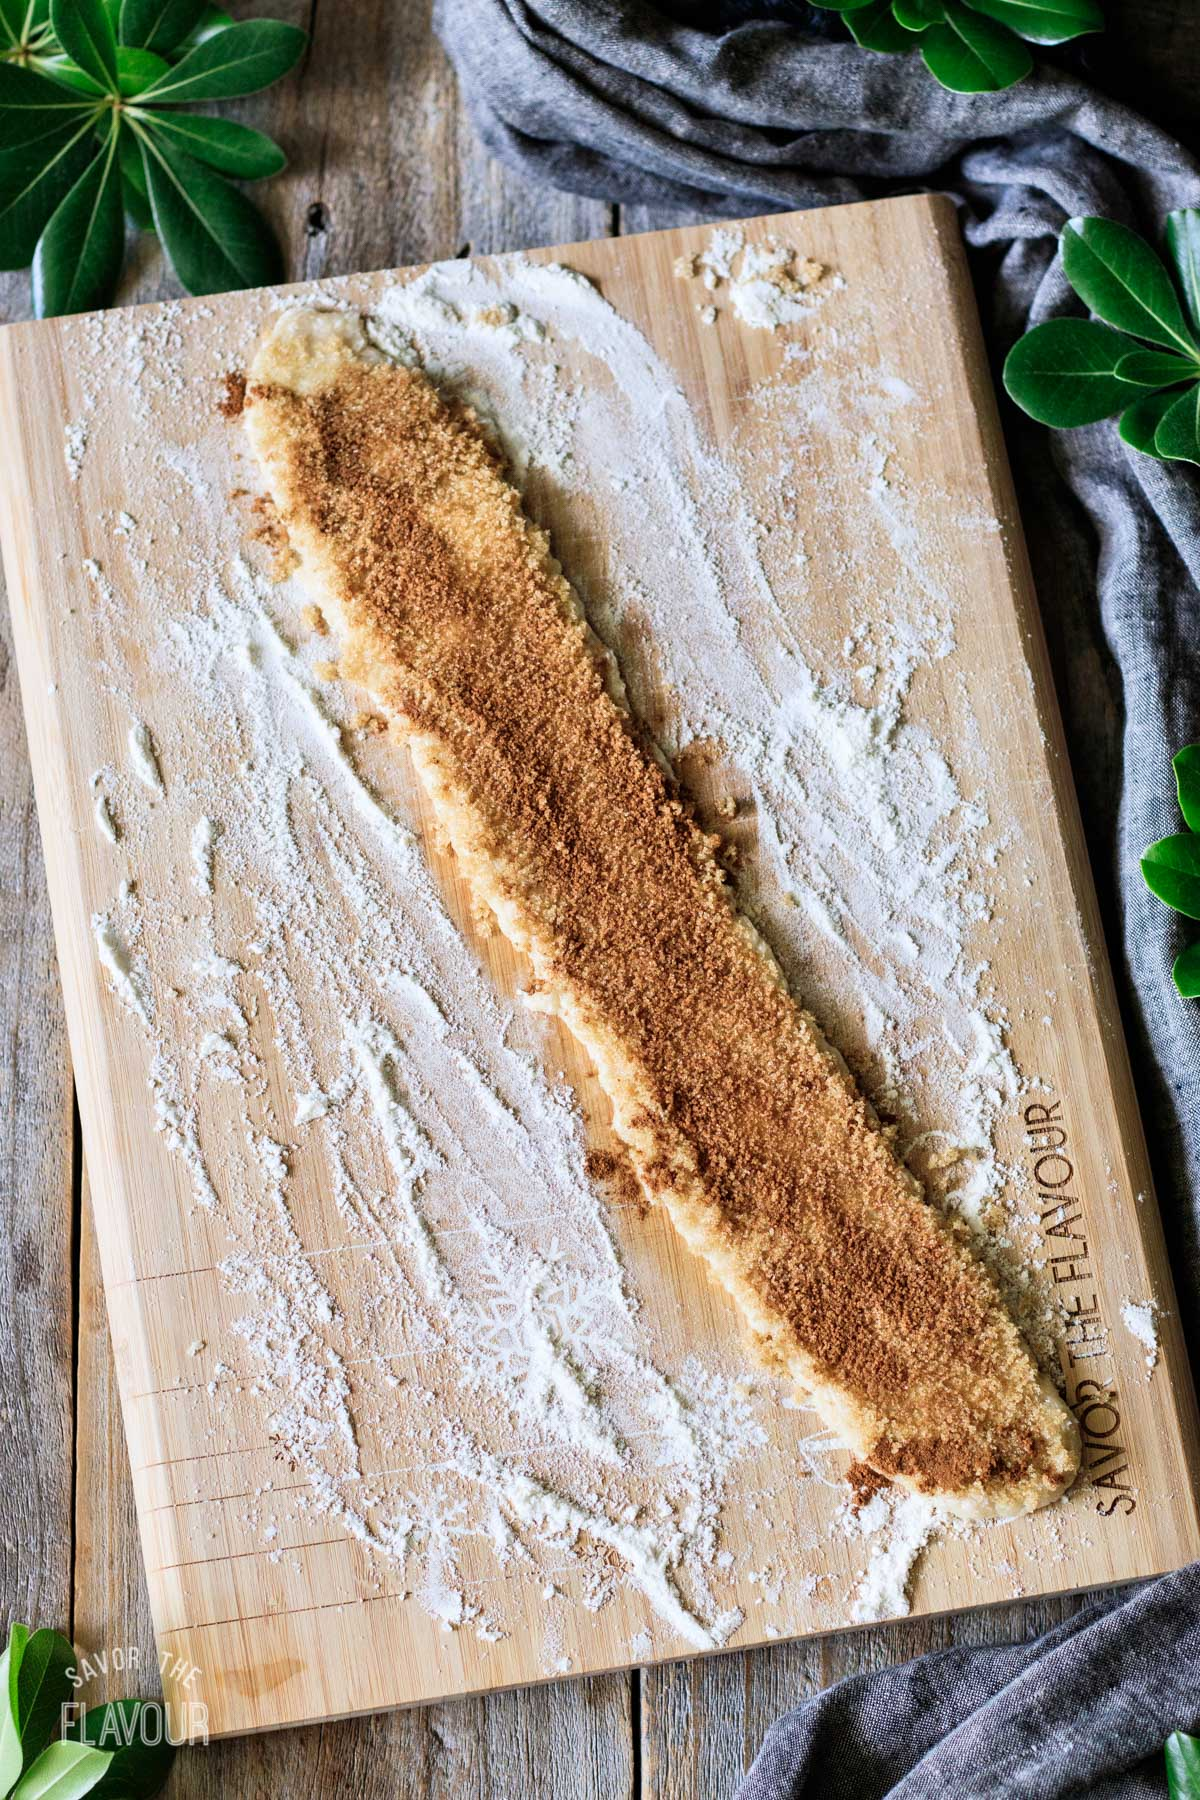 dough sprinkled with cinnamon sugar on a cutting board